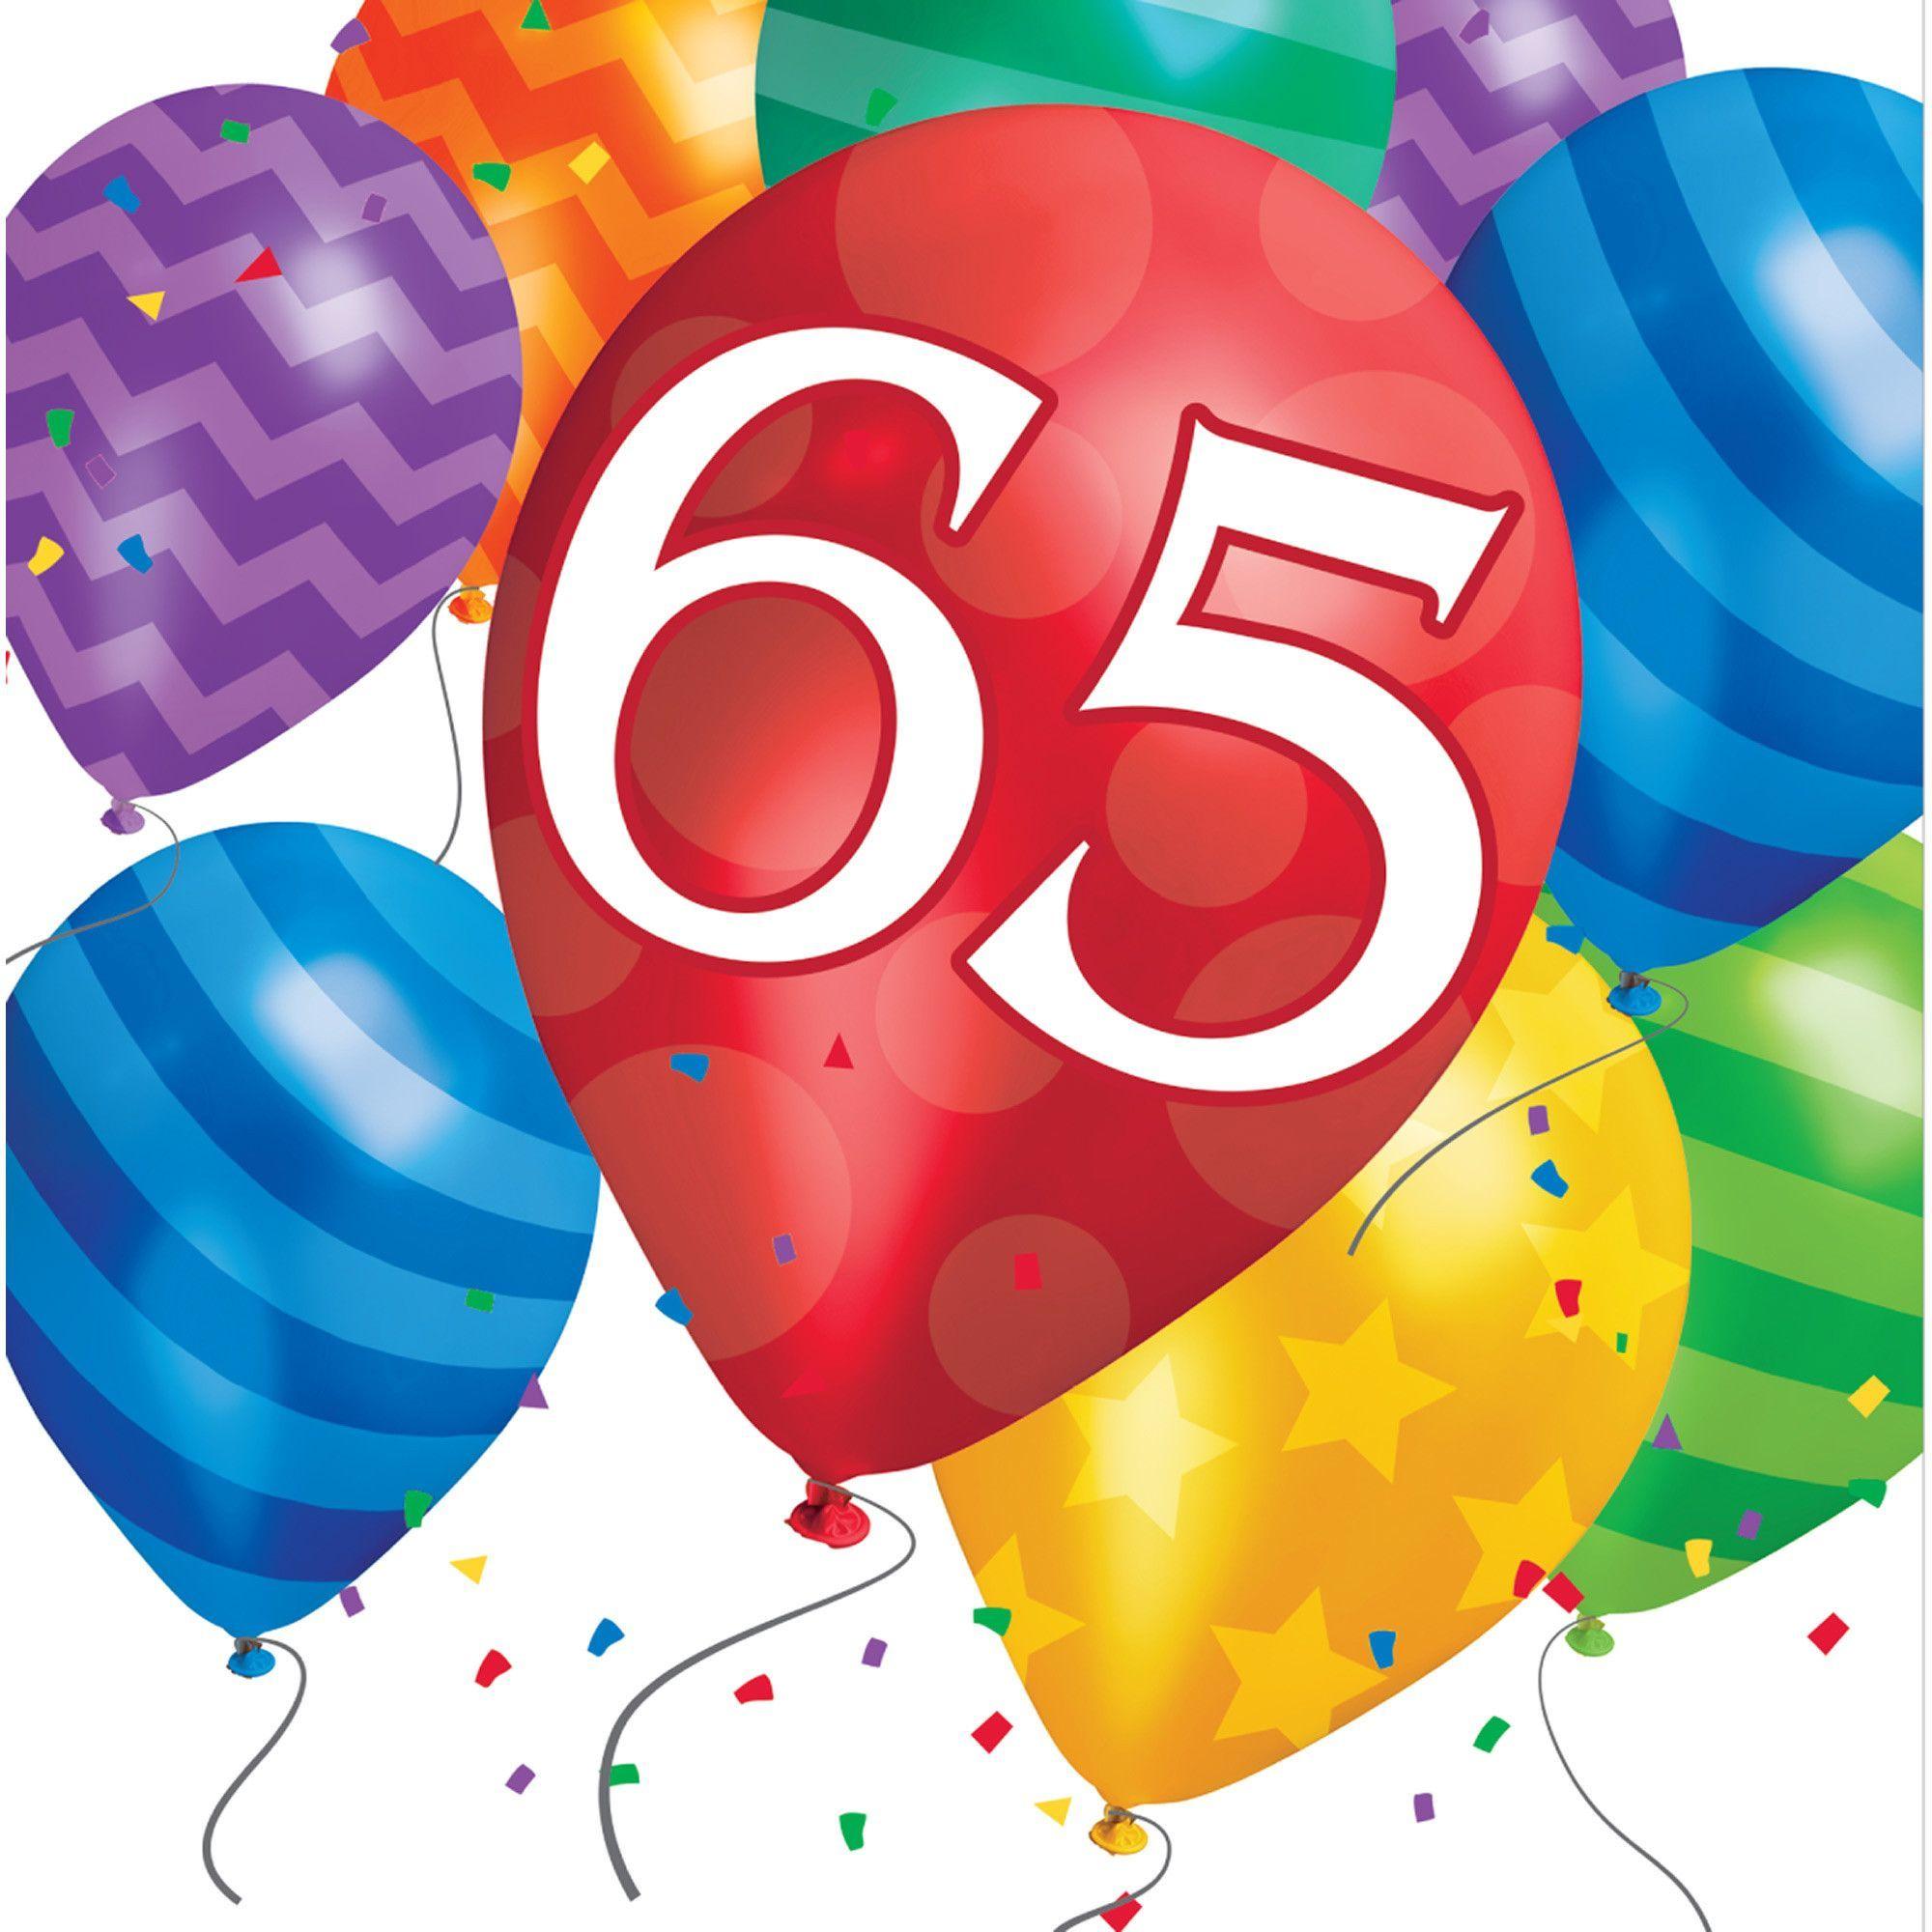 Balloon Blast 65th Birthday Lunch Napkins Case Of 192